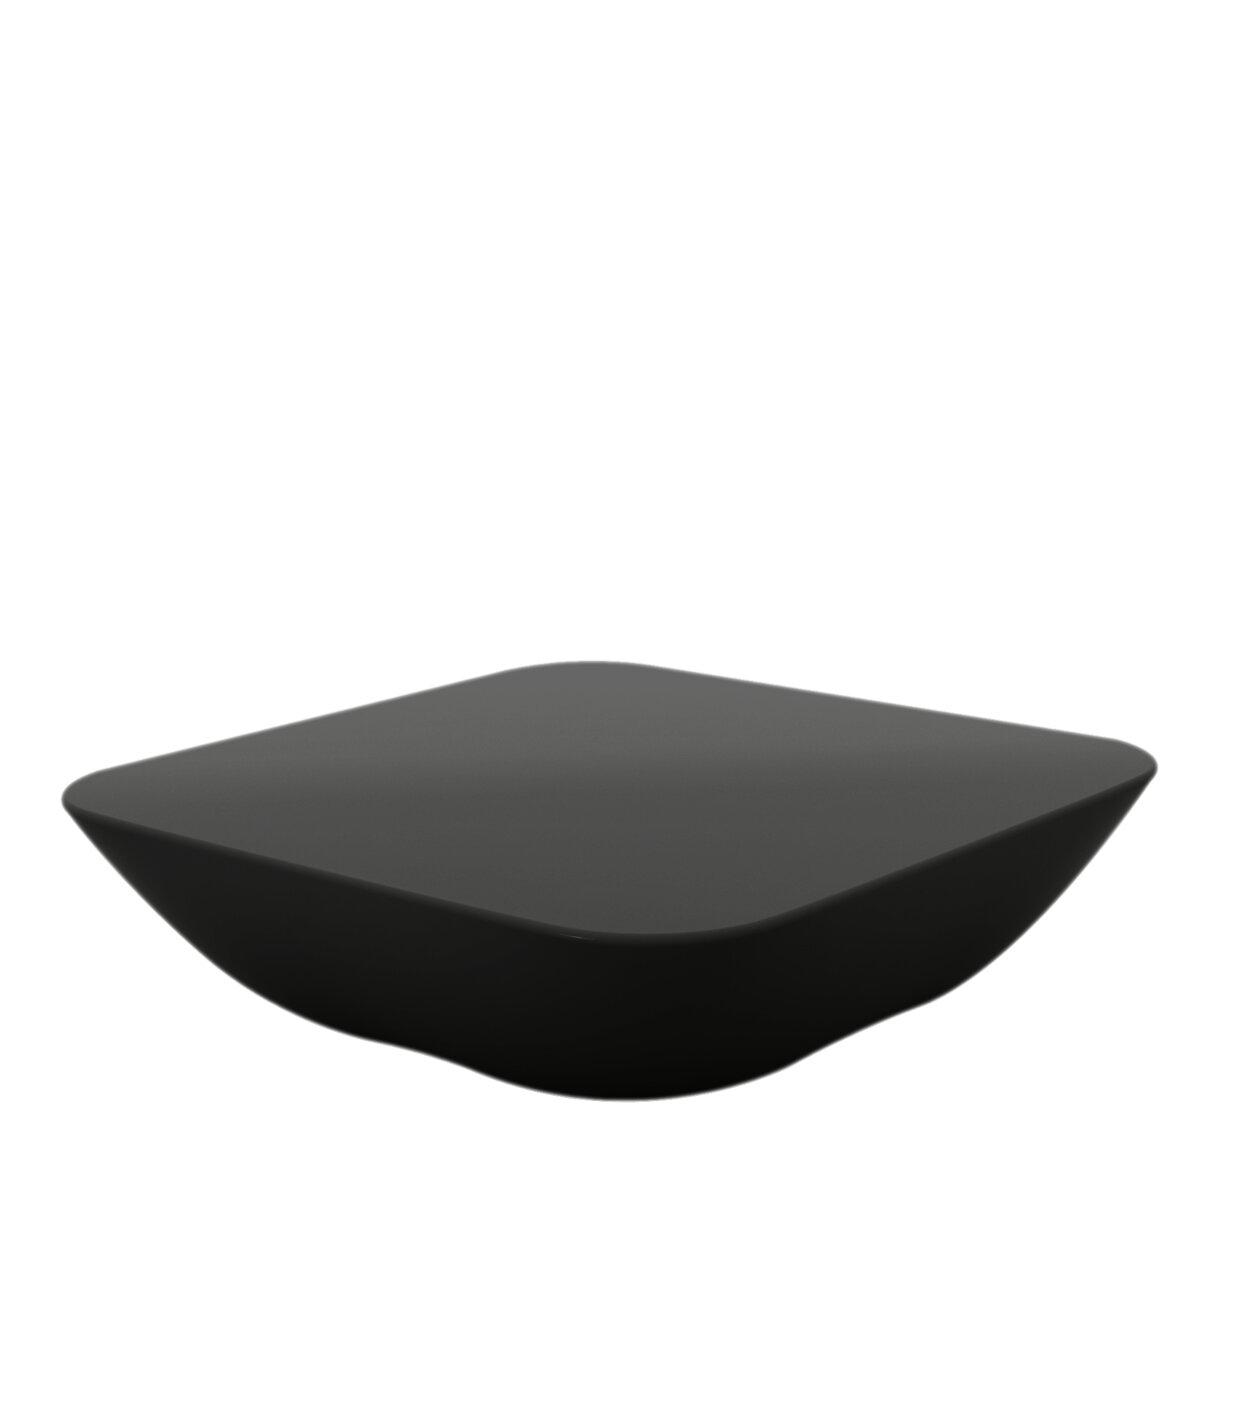 Vondom Pillow Plastic Coffee Table Wayfair